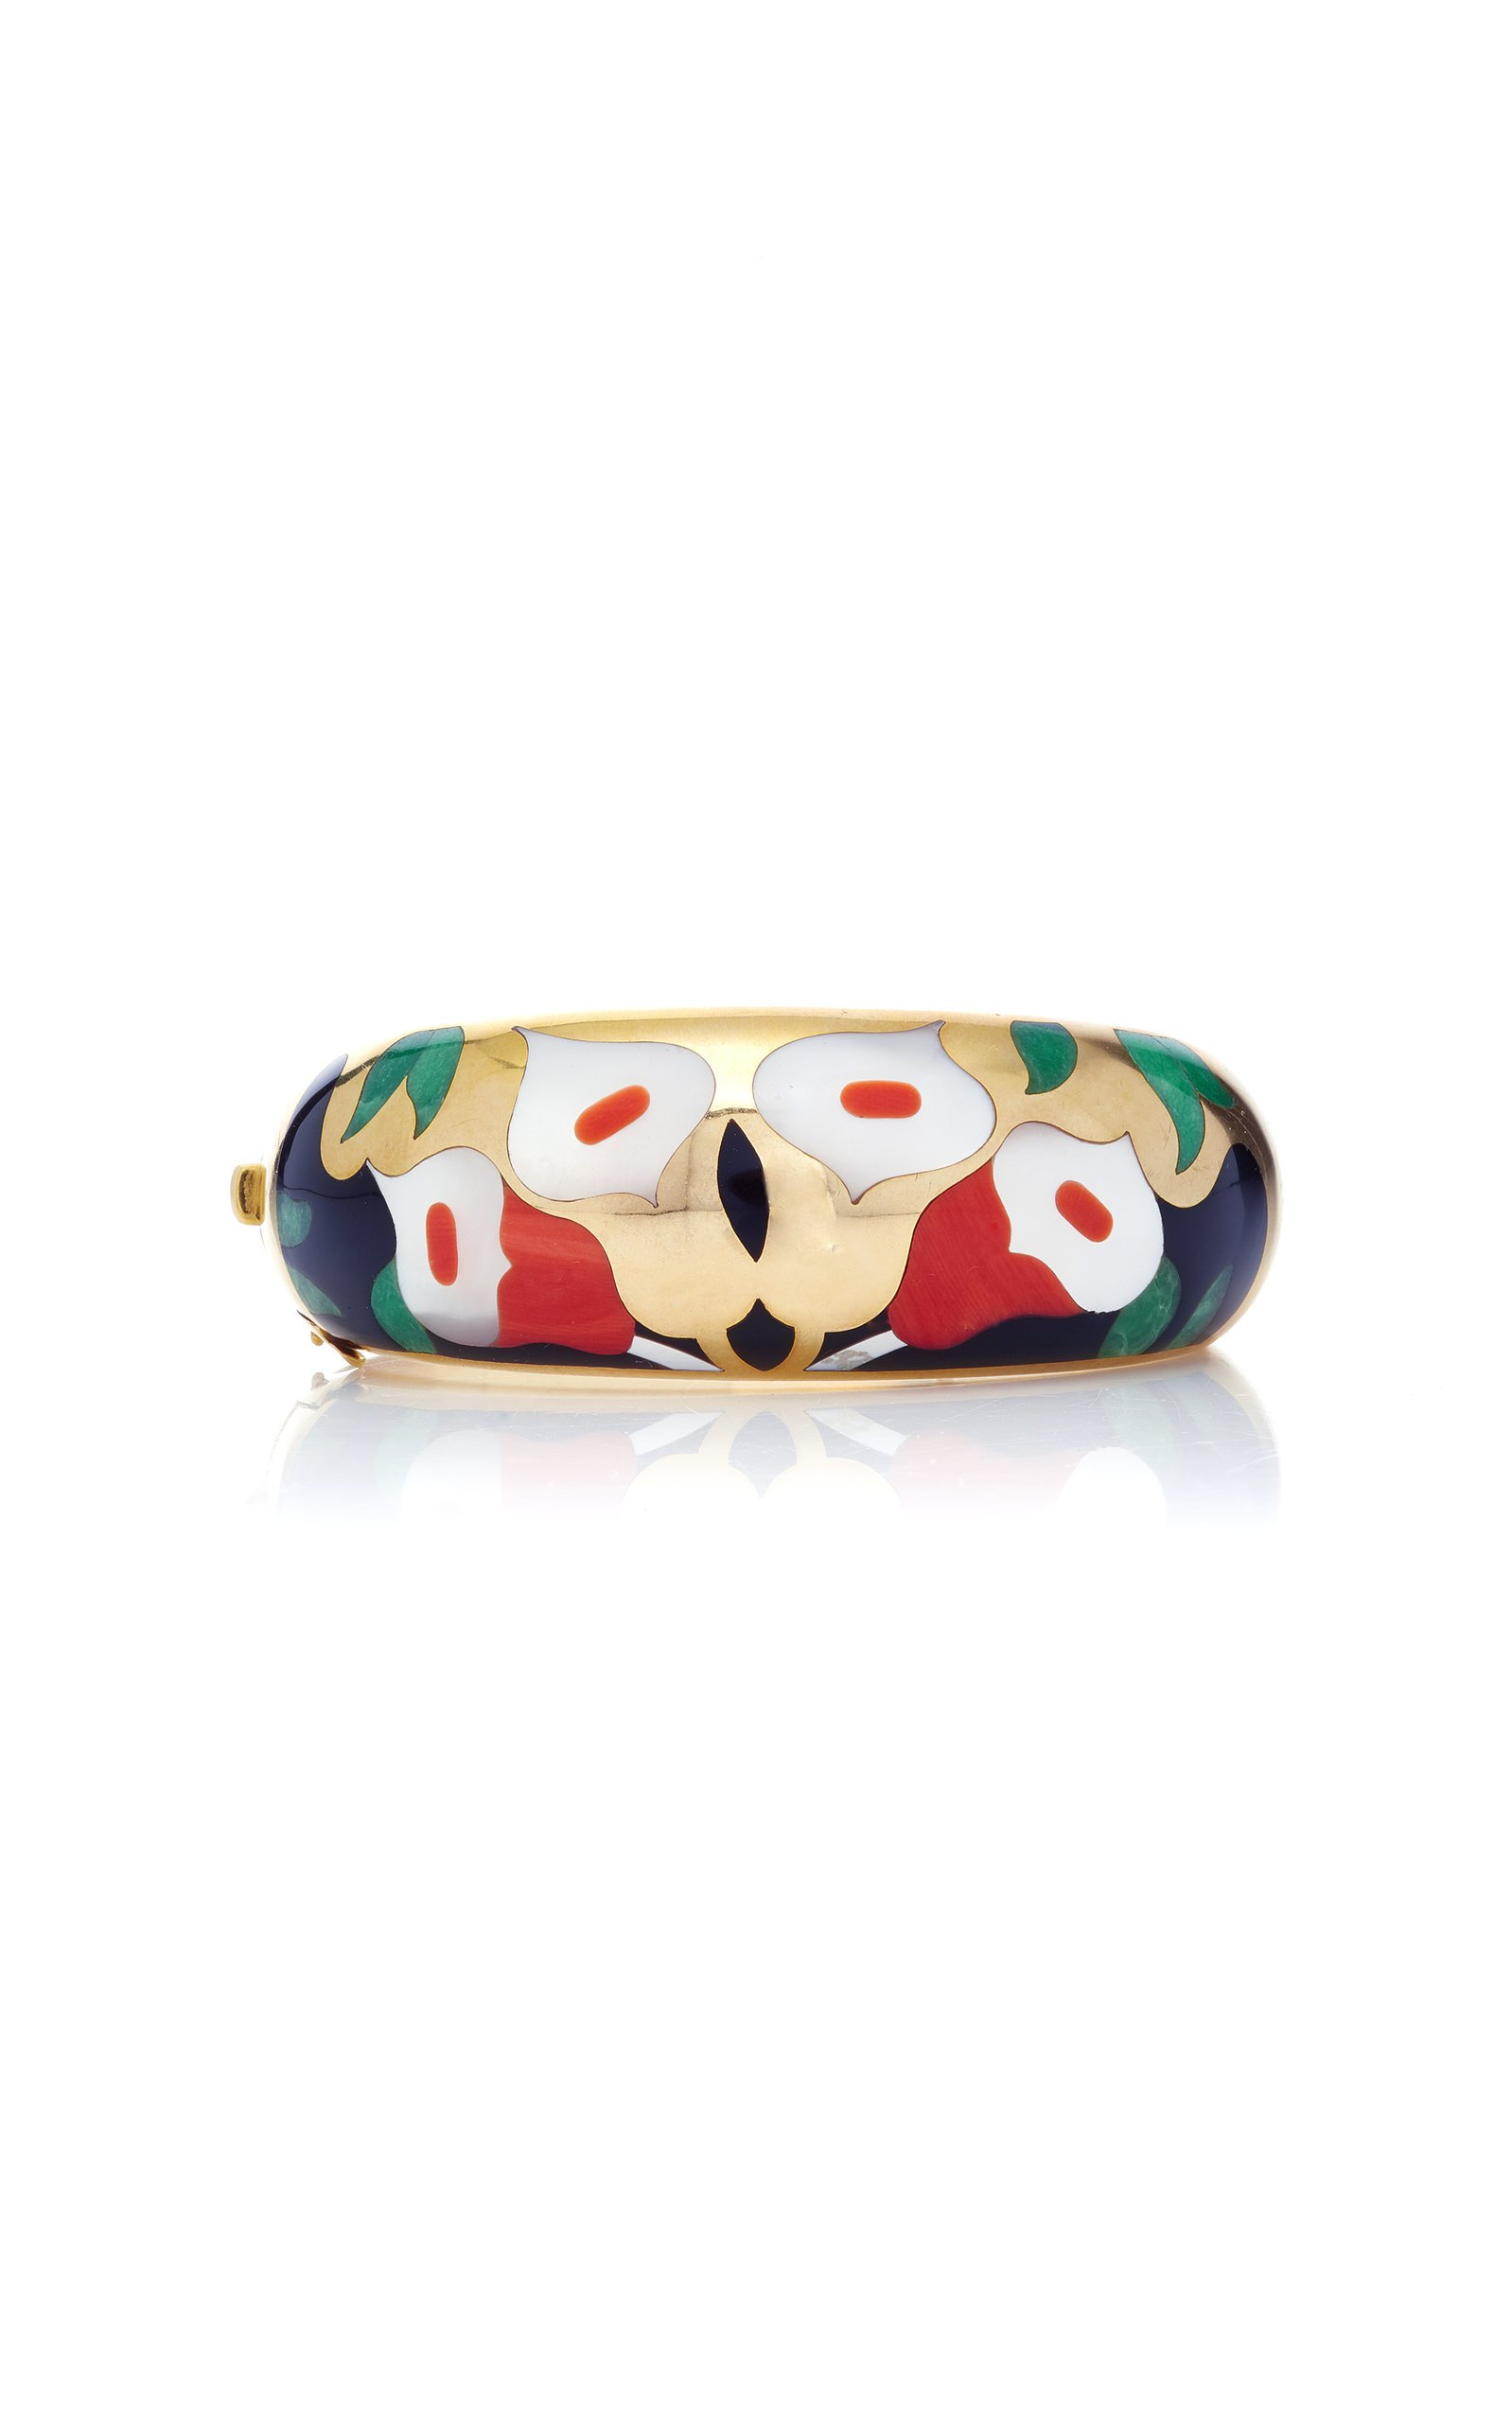 14K Gold And Pearl Bracelet by Vintage Asch Grossbardt   Moda Operandi